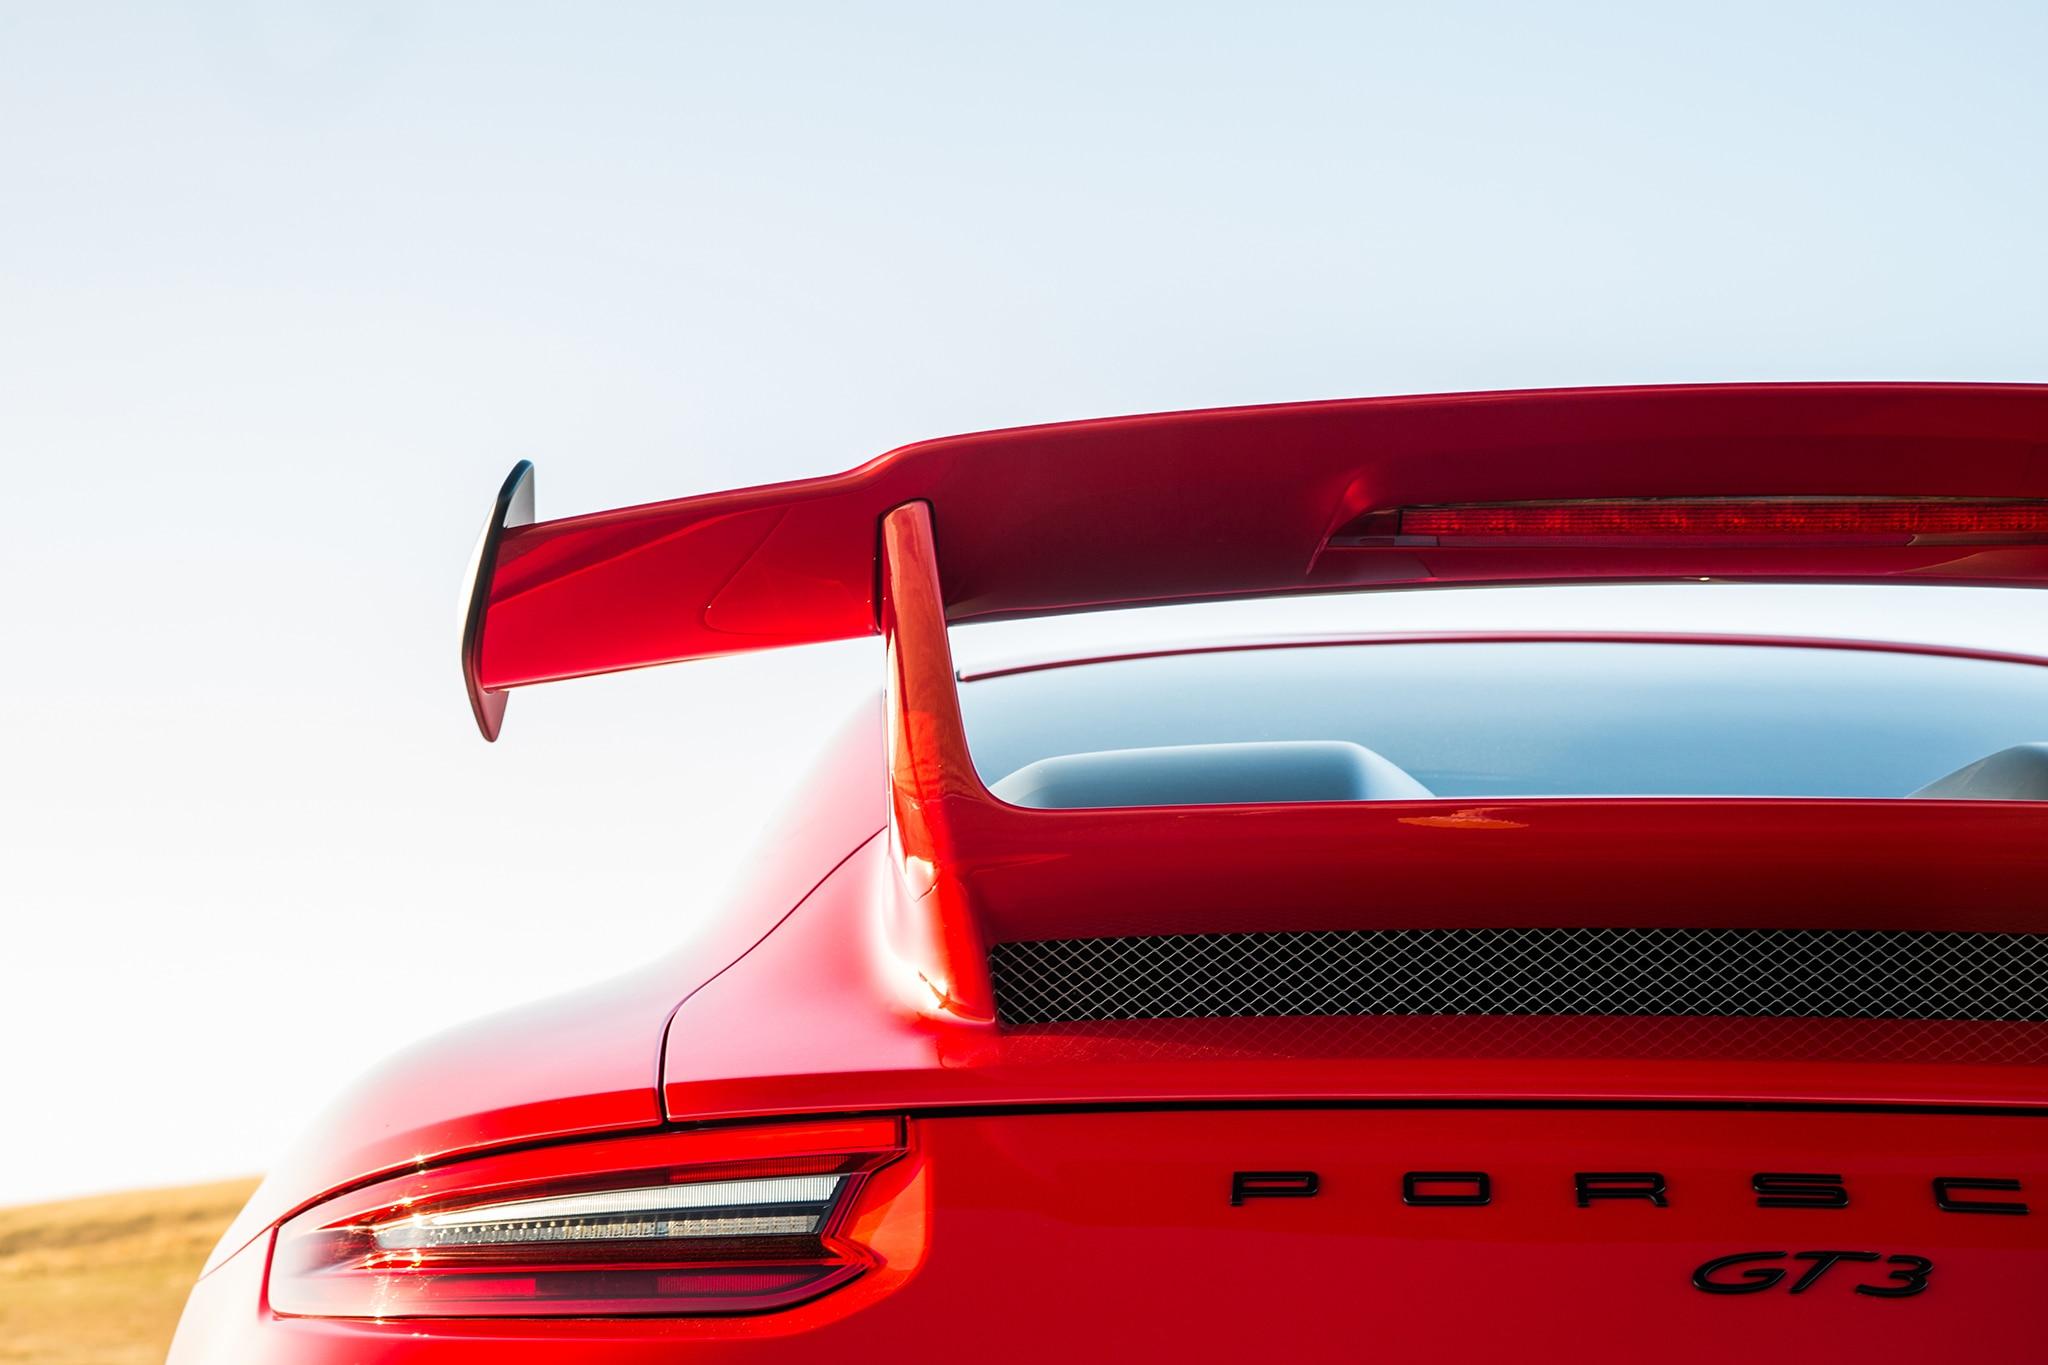 2018 porsche 911 gts. interesting 2018 show more to 2018 porsche 911 gts